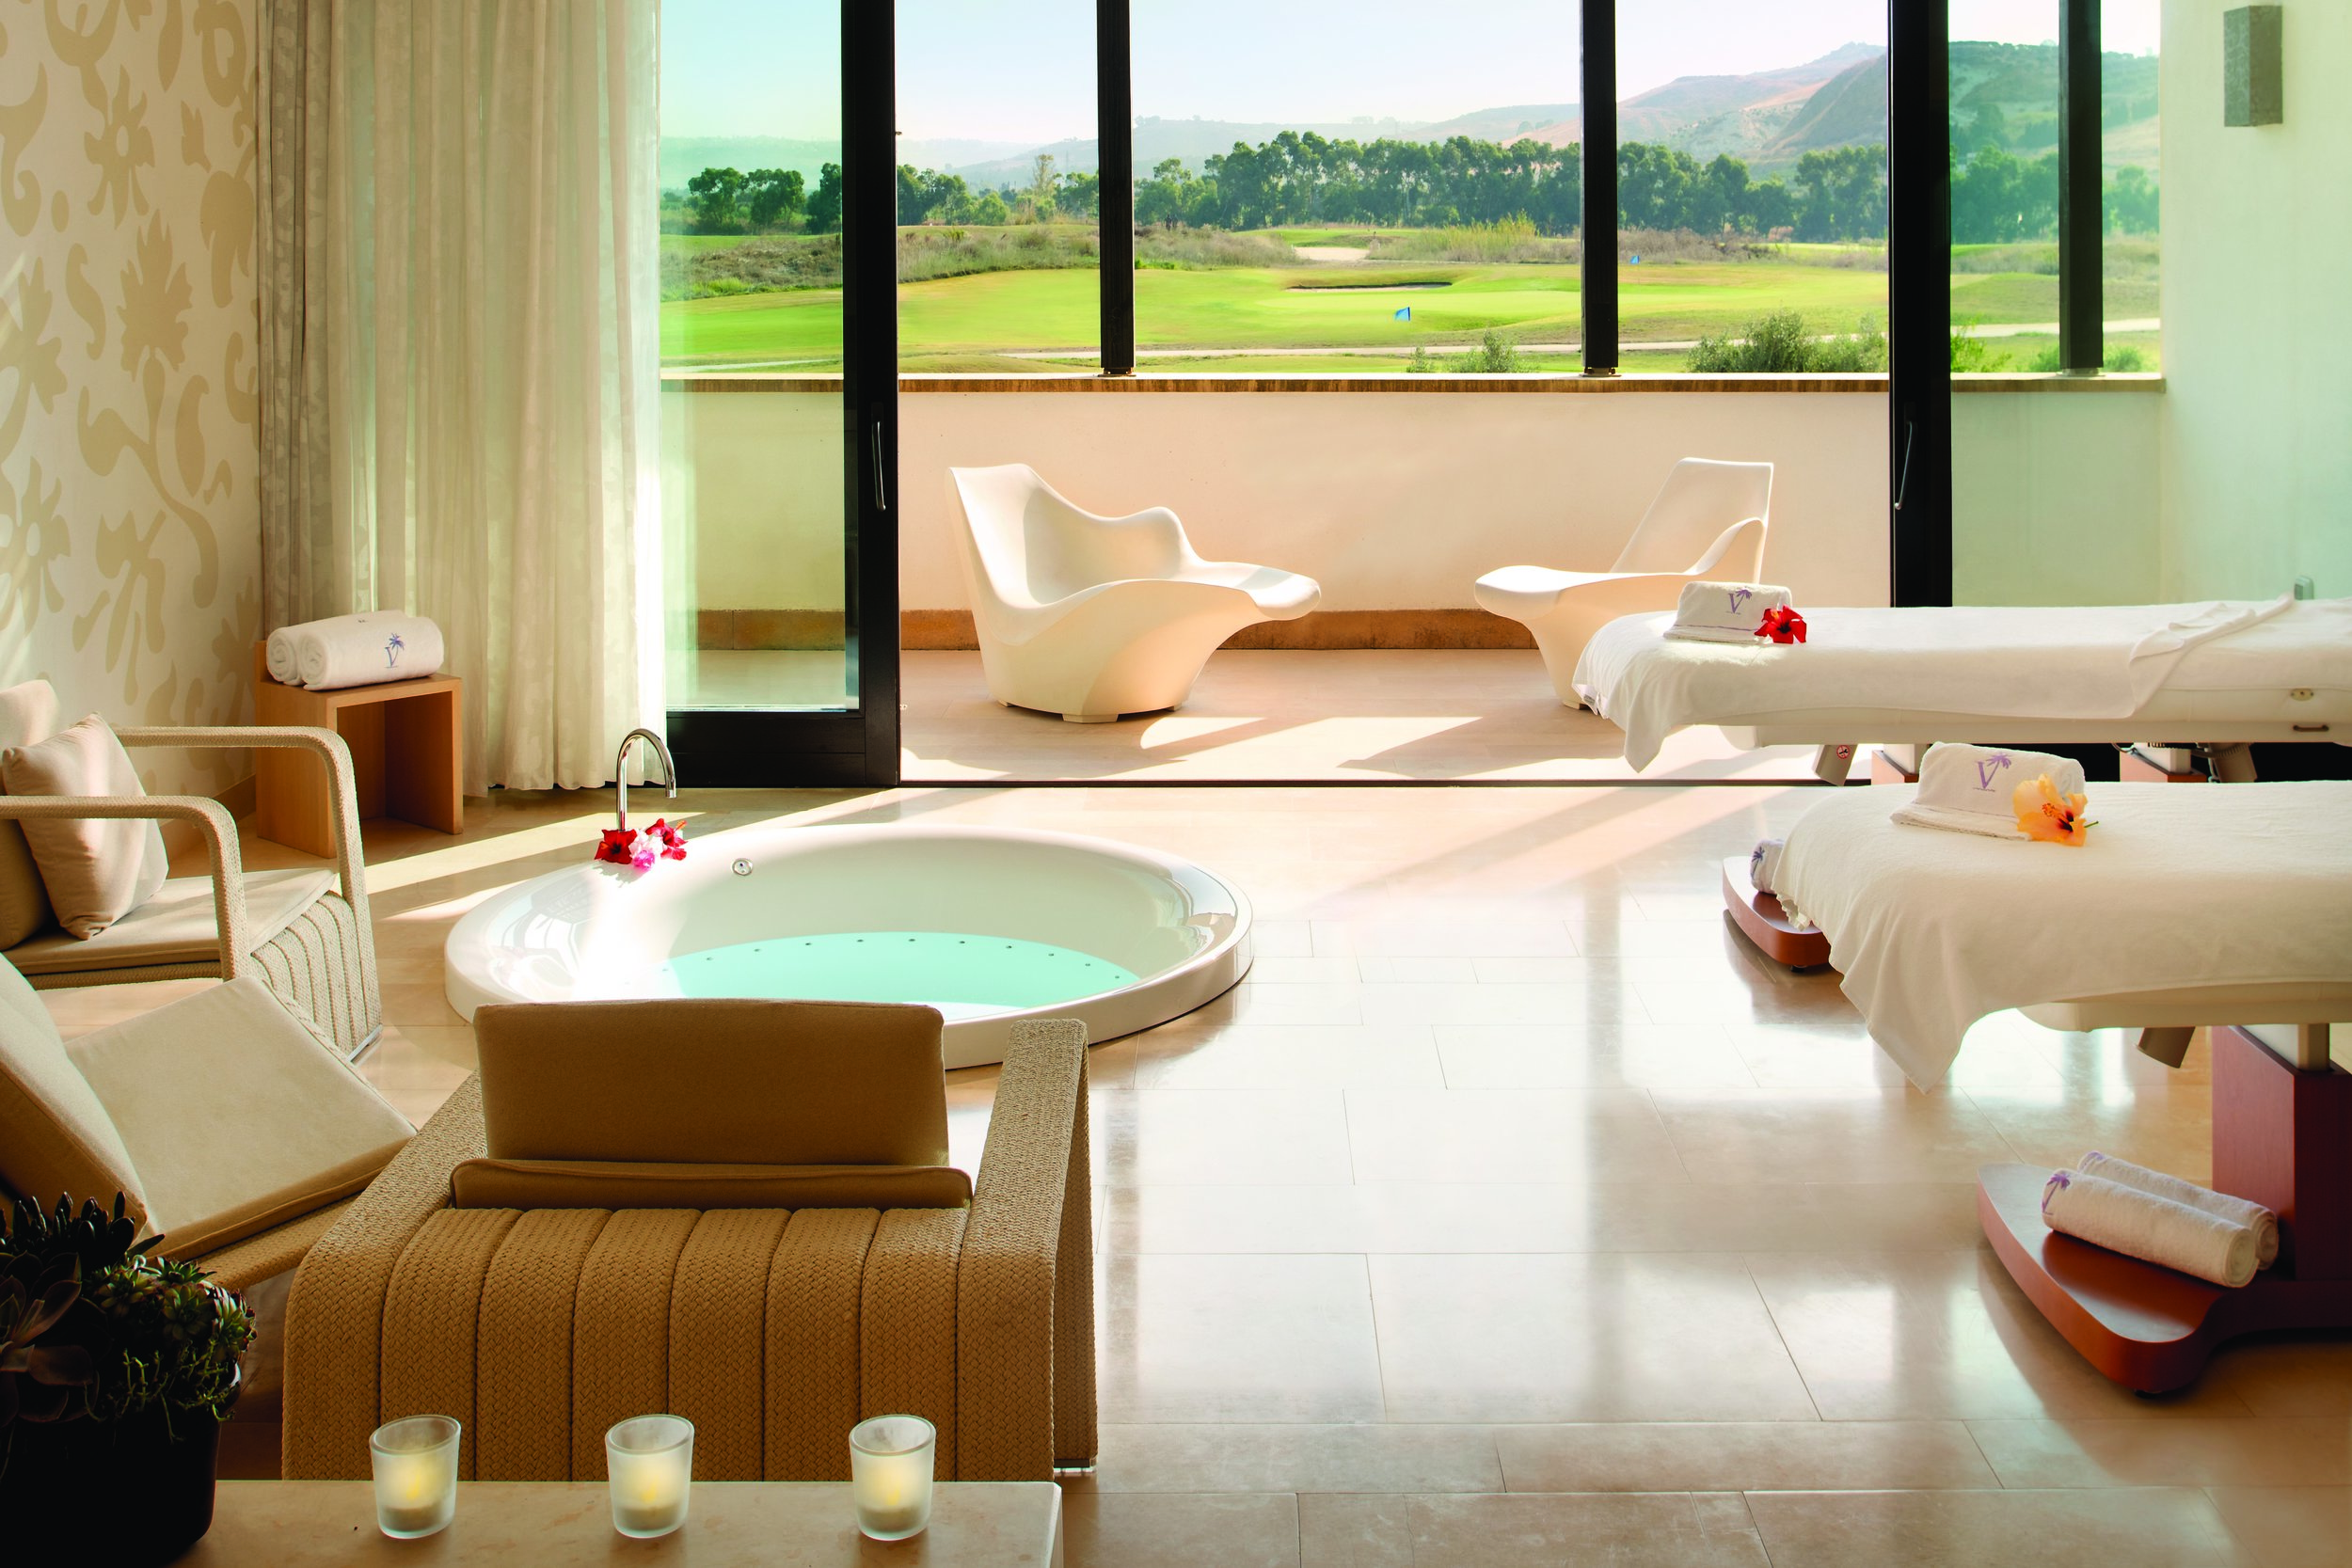 45 RFH Verdura Resort - Verdura Spa Treatment Room 978944 VRX Sep 14.jpg